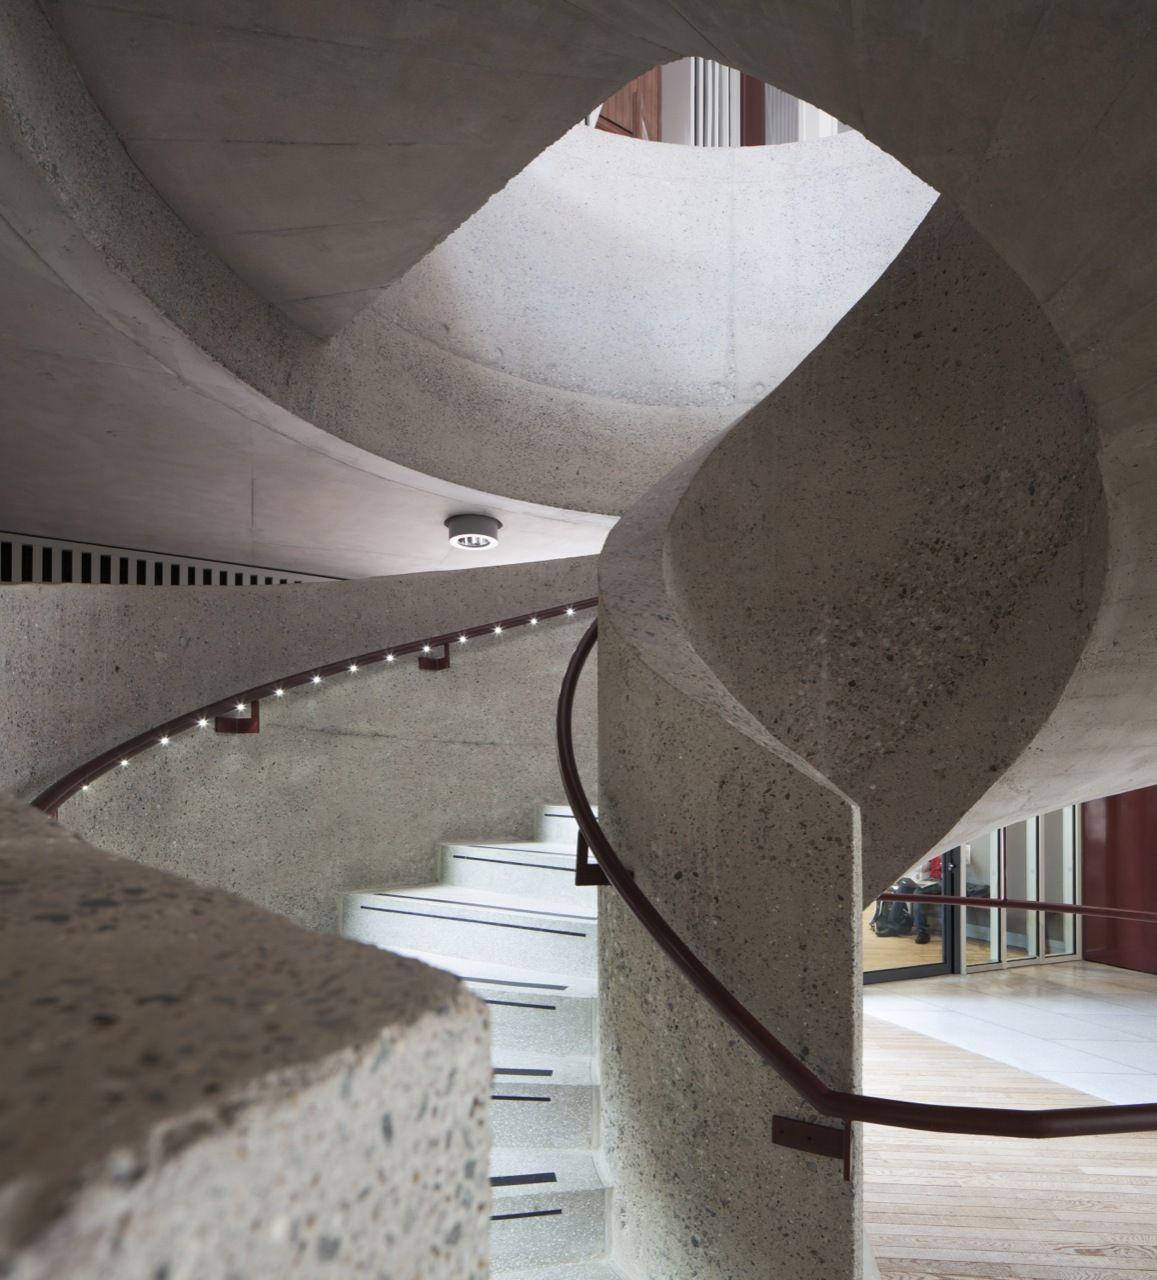 Galería - Centro de Estudiantes LSE Saw Hock / O'Donnell   Tuomey Architects - 51